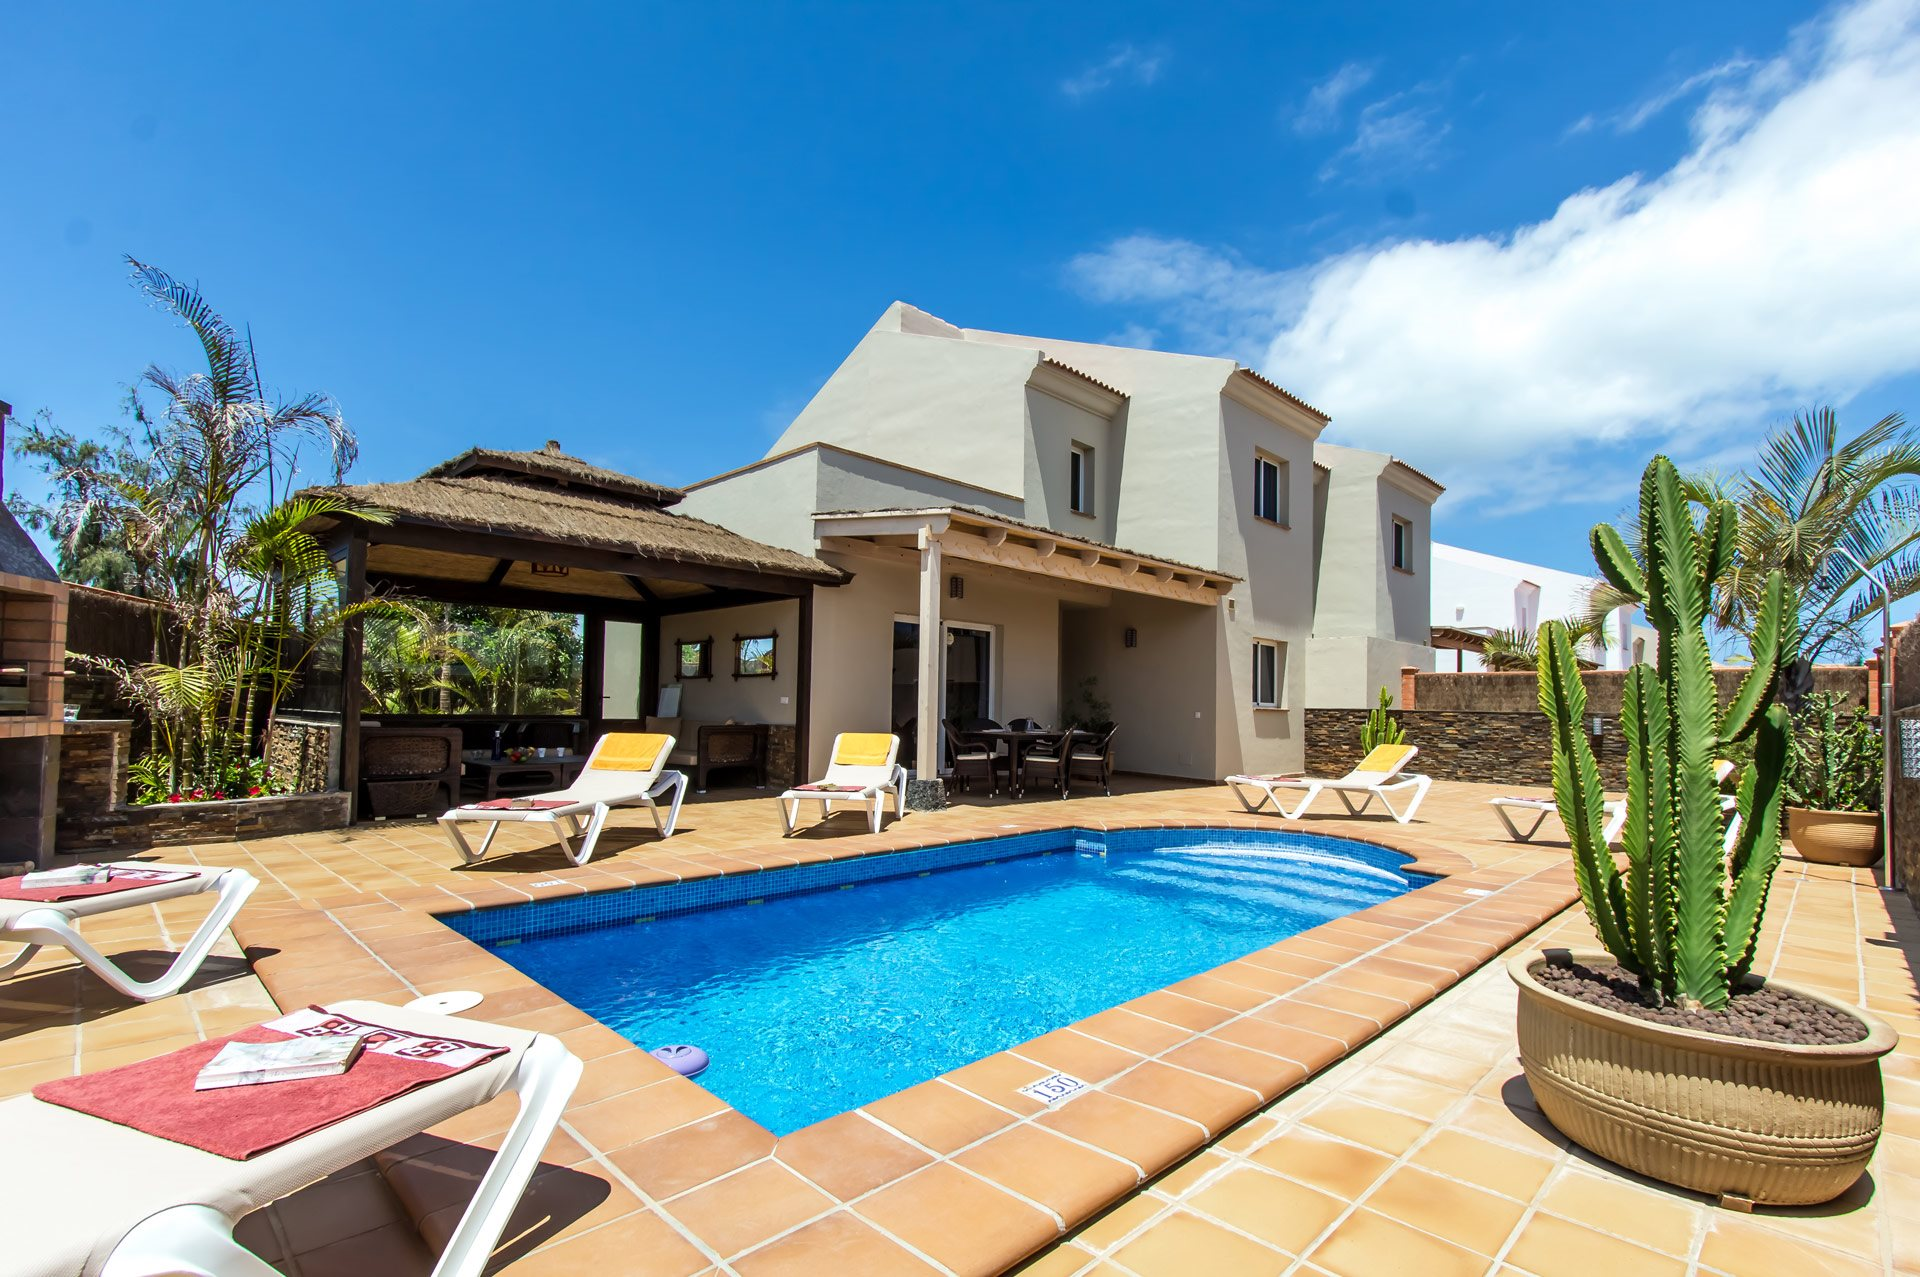 Villa Lisa, Corralejo, Fuerteventura, Spain